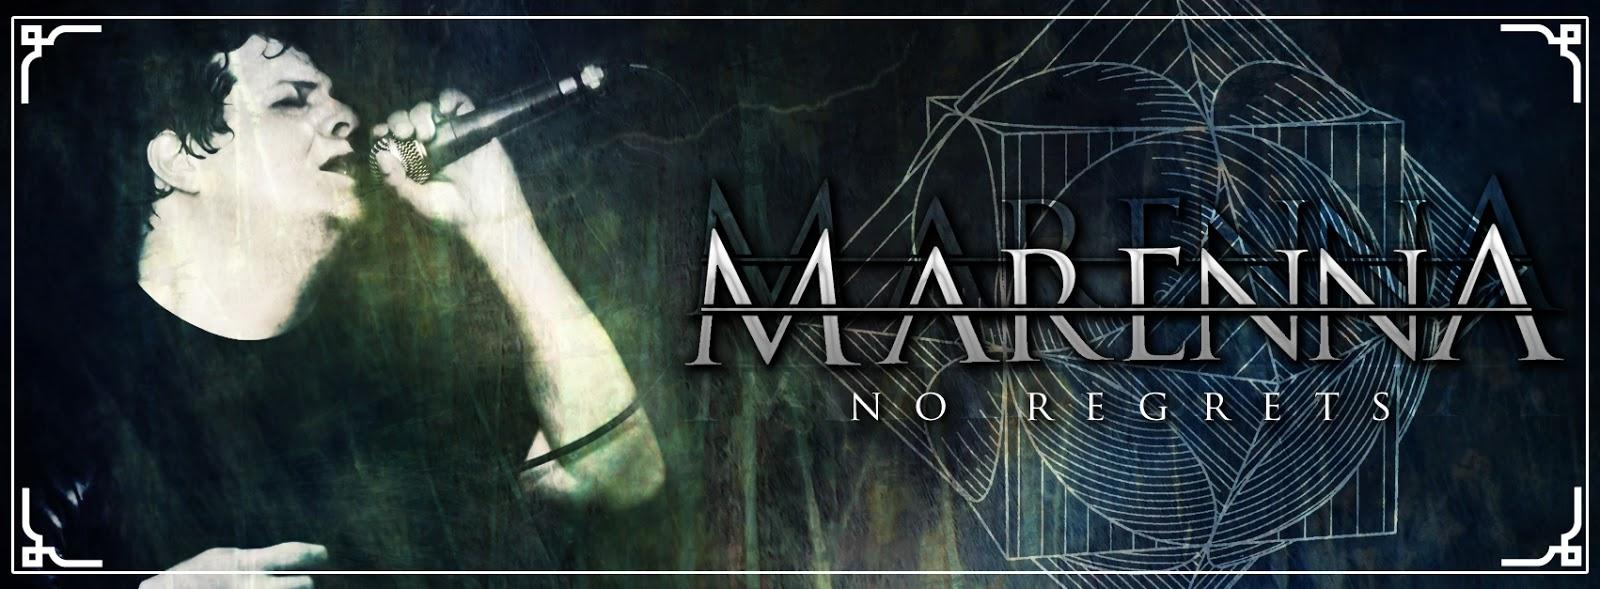 Fallow Marenna on Facebook